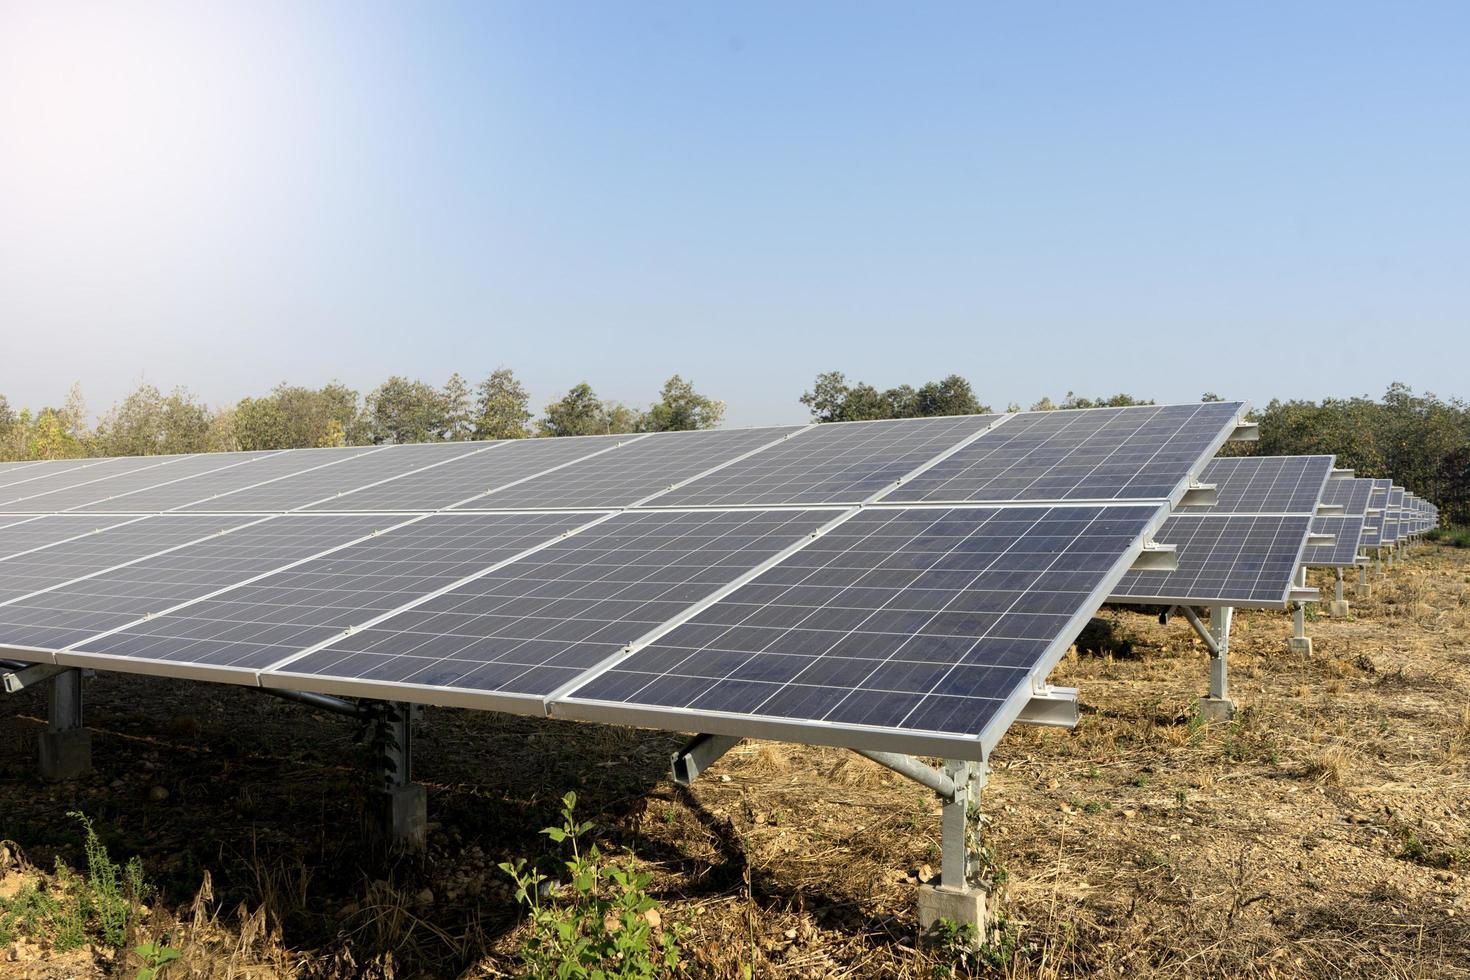 Solar farm providing green energy photo